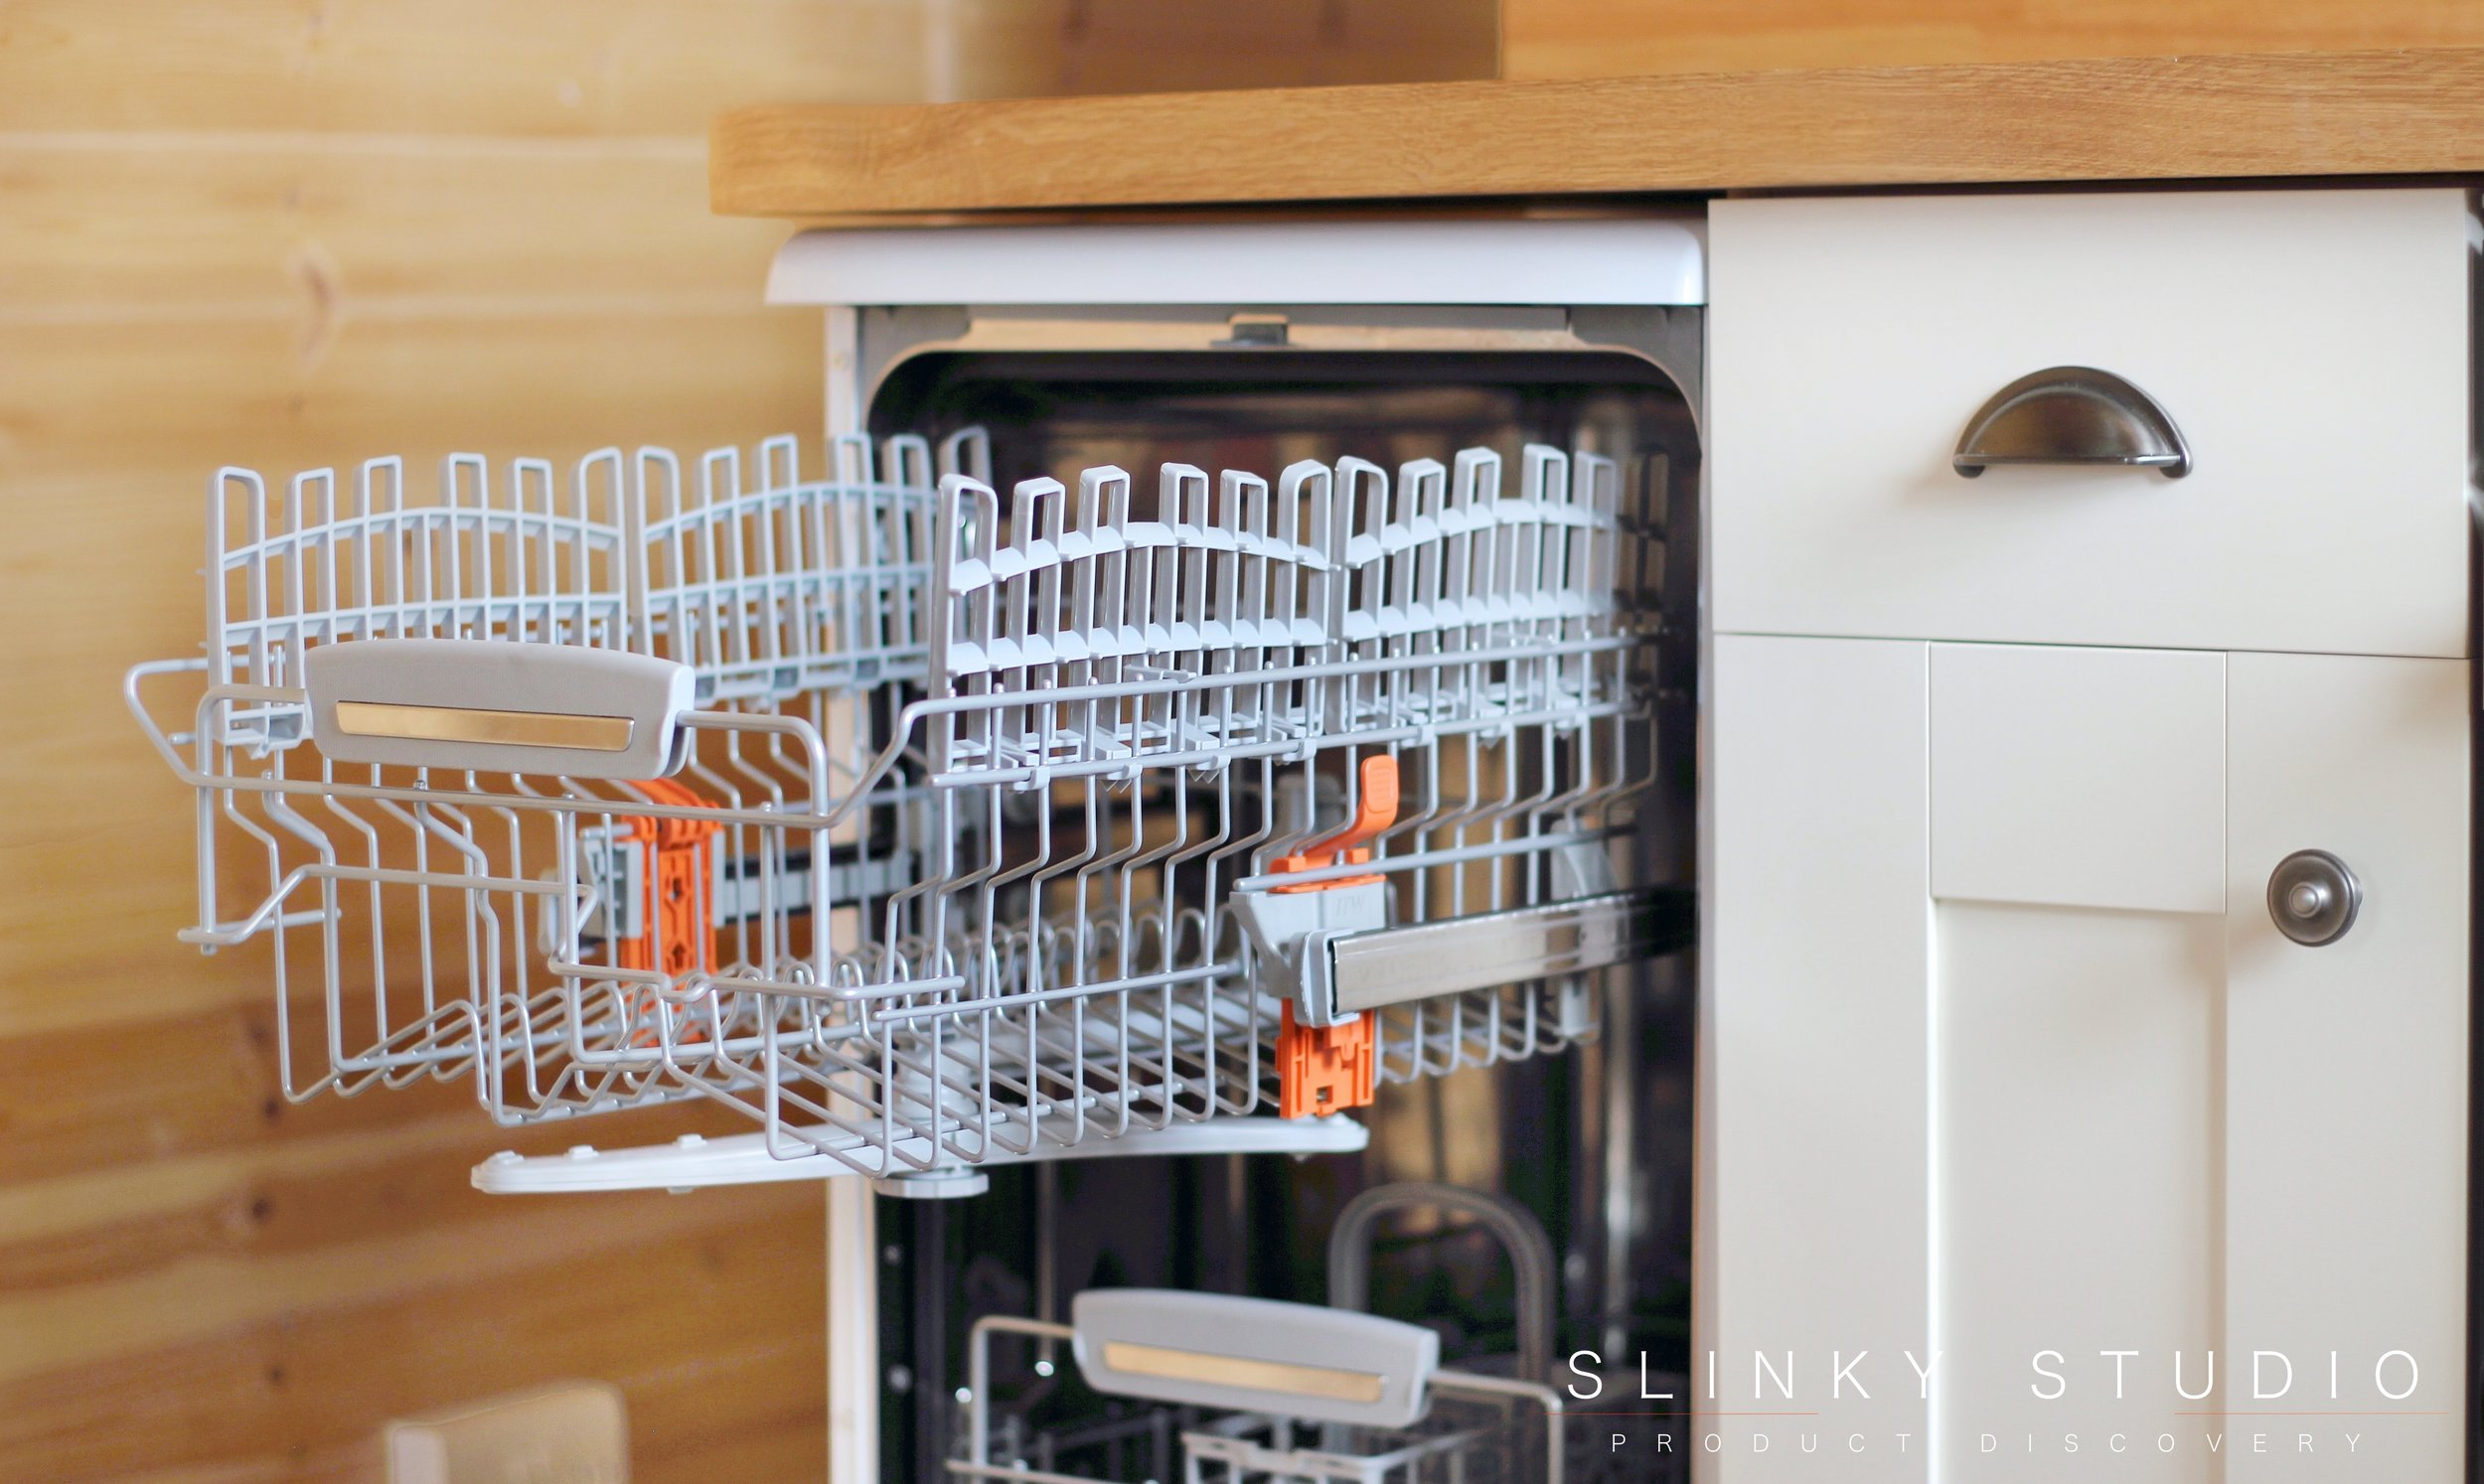 Hotpoint+Ultima+Slimline+Dishwasher+Shaker+Cream+Top+Basket+Rack+Drawer.jpg